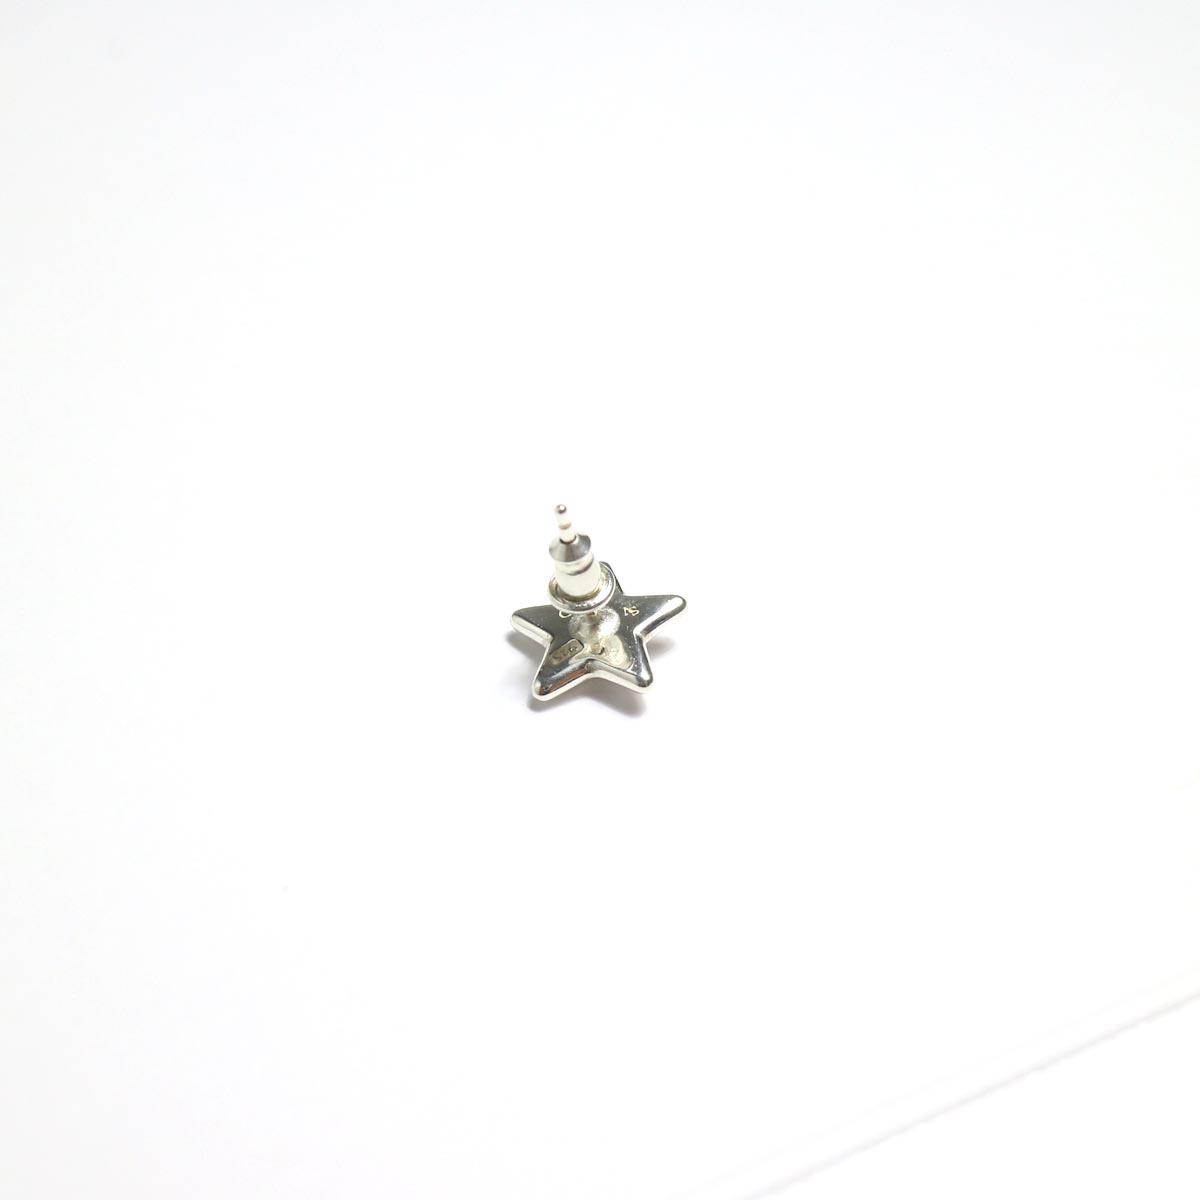 END / Rim Star Pierce キャッチ